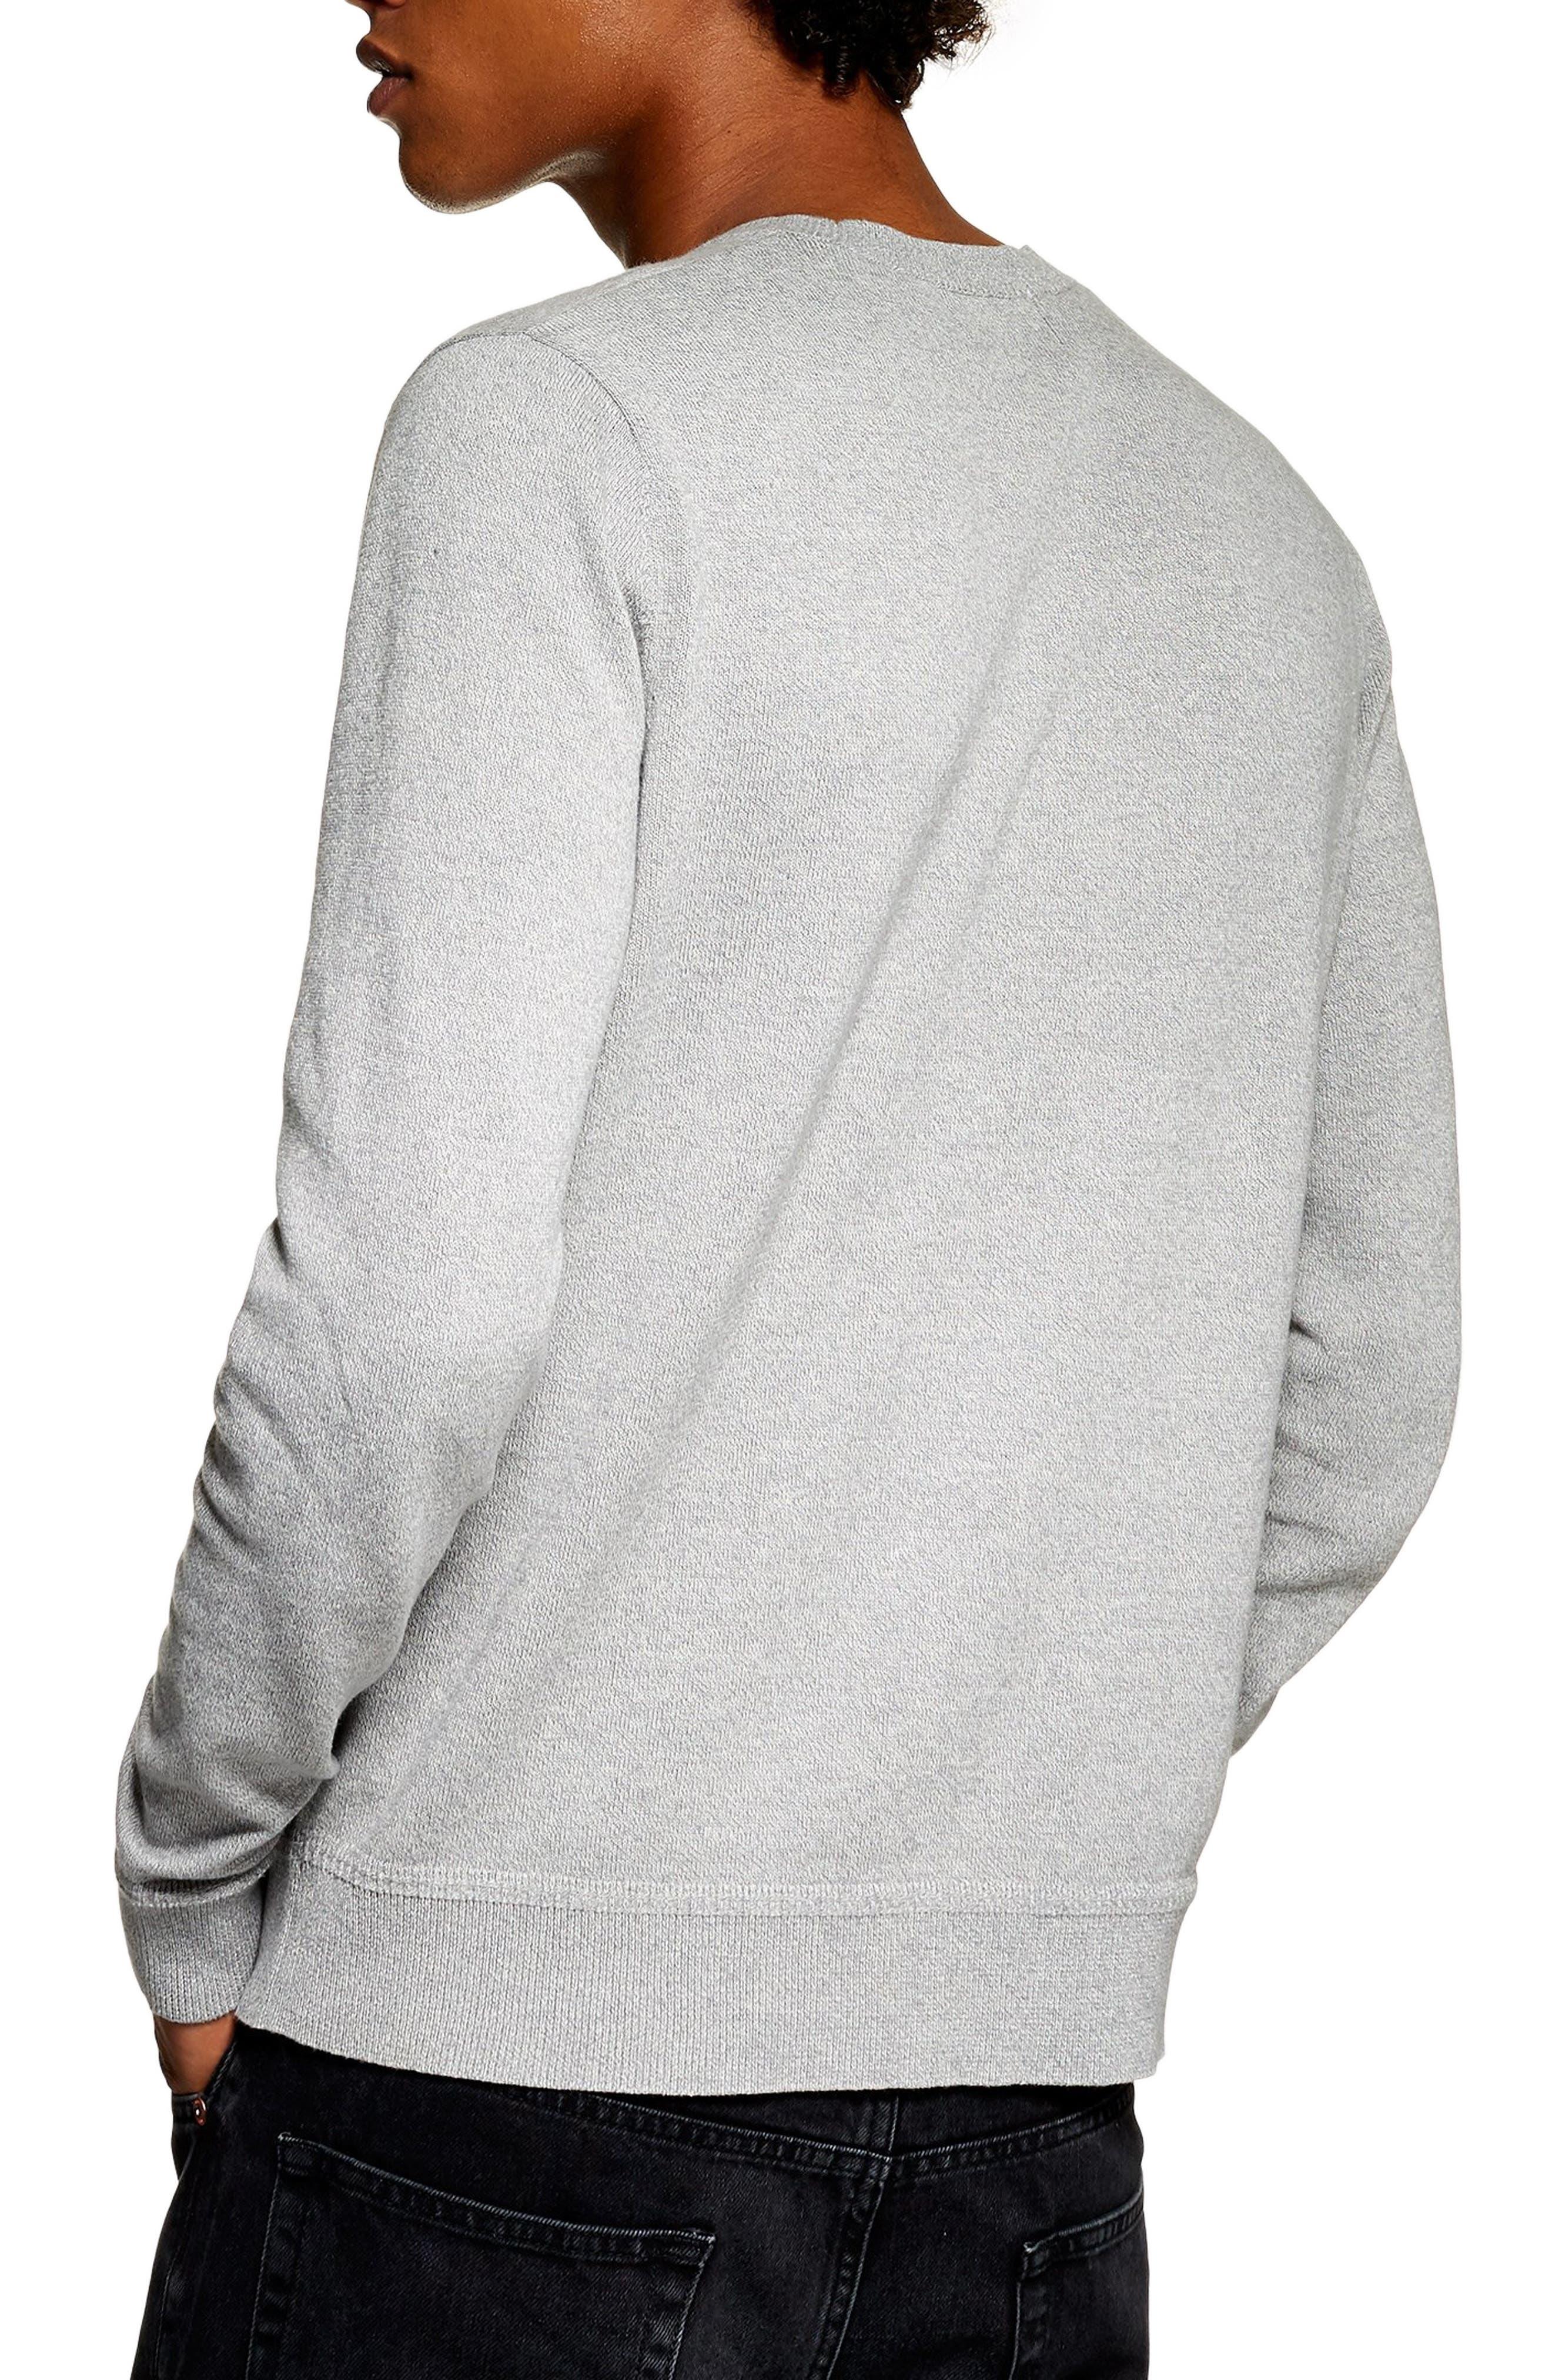 Marl Crewneck Sweater,                             Alternate thumbnail 2, color,                             CREAM